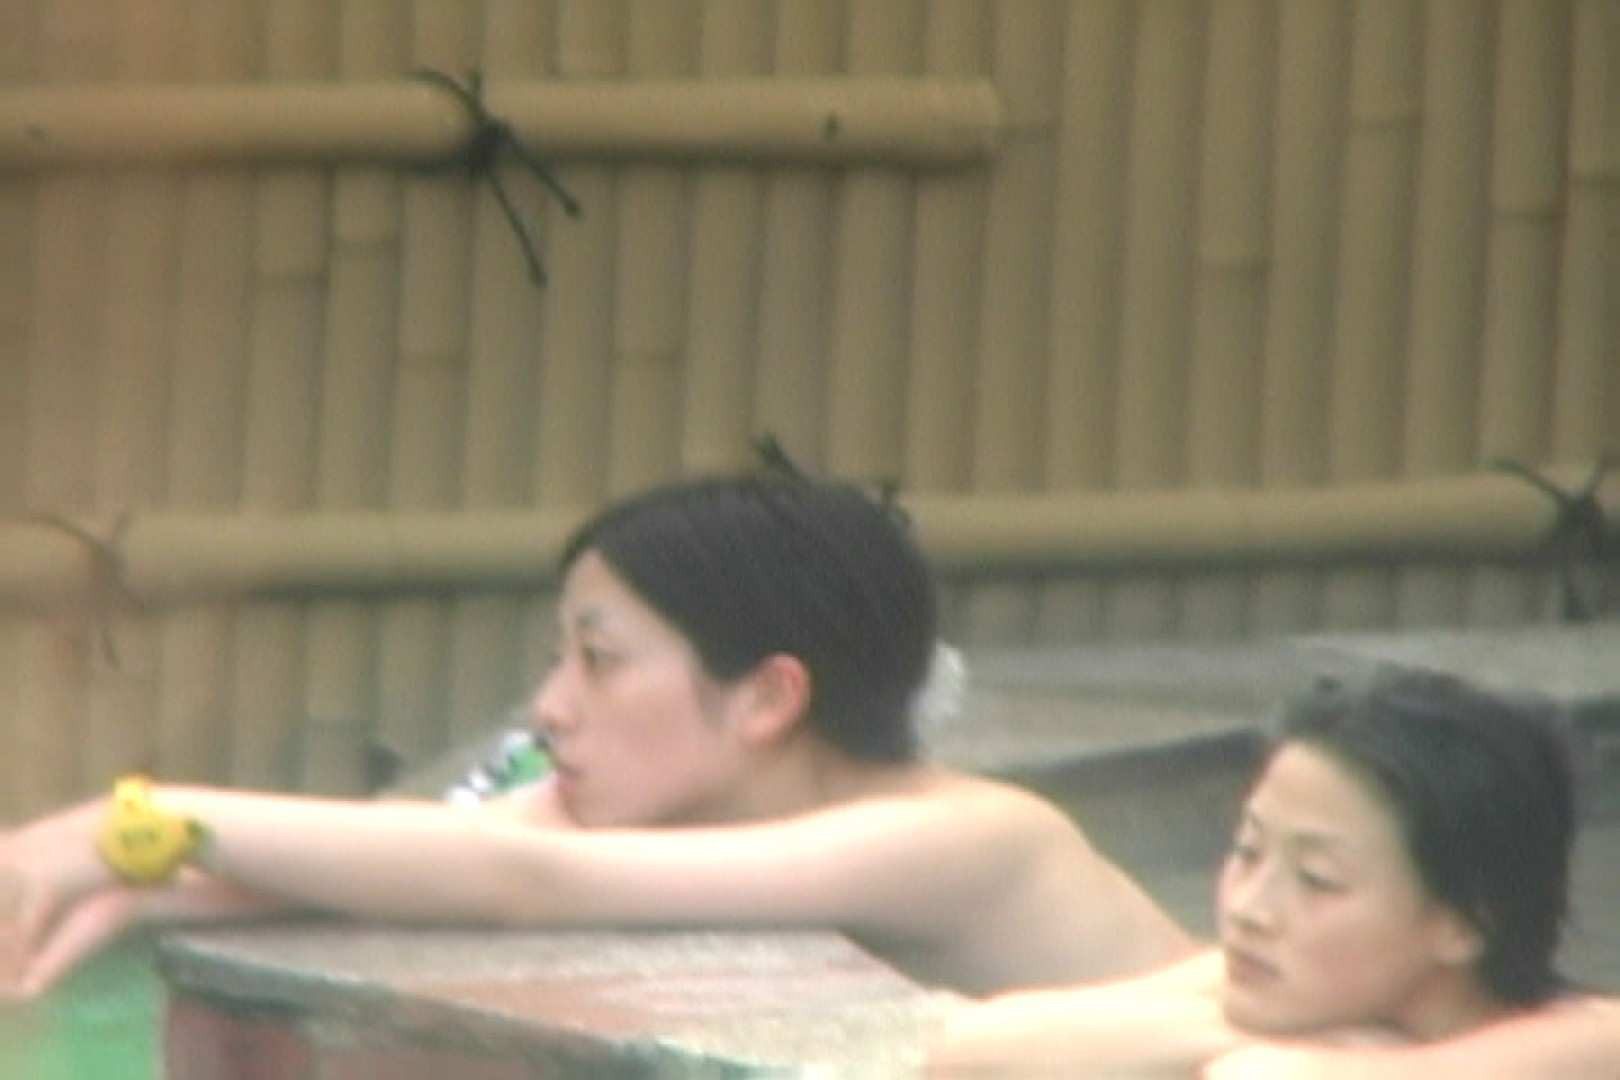 Aquaな露天風呂Vol.562 OLセックス  109画像 6